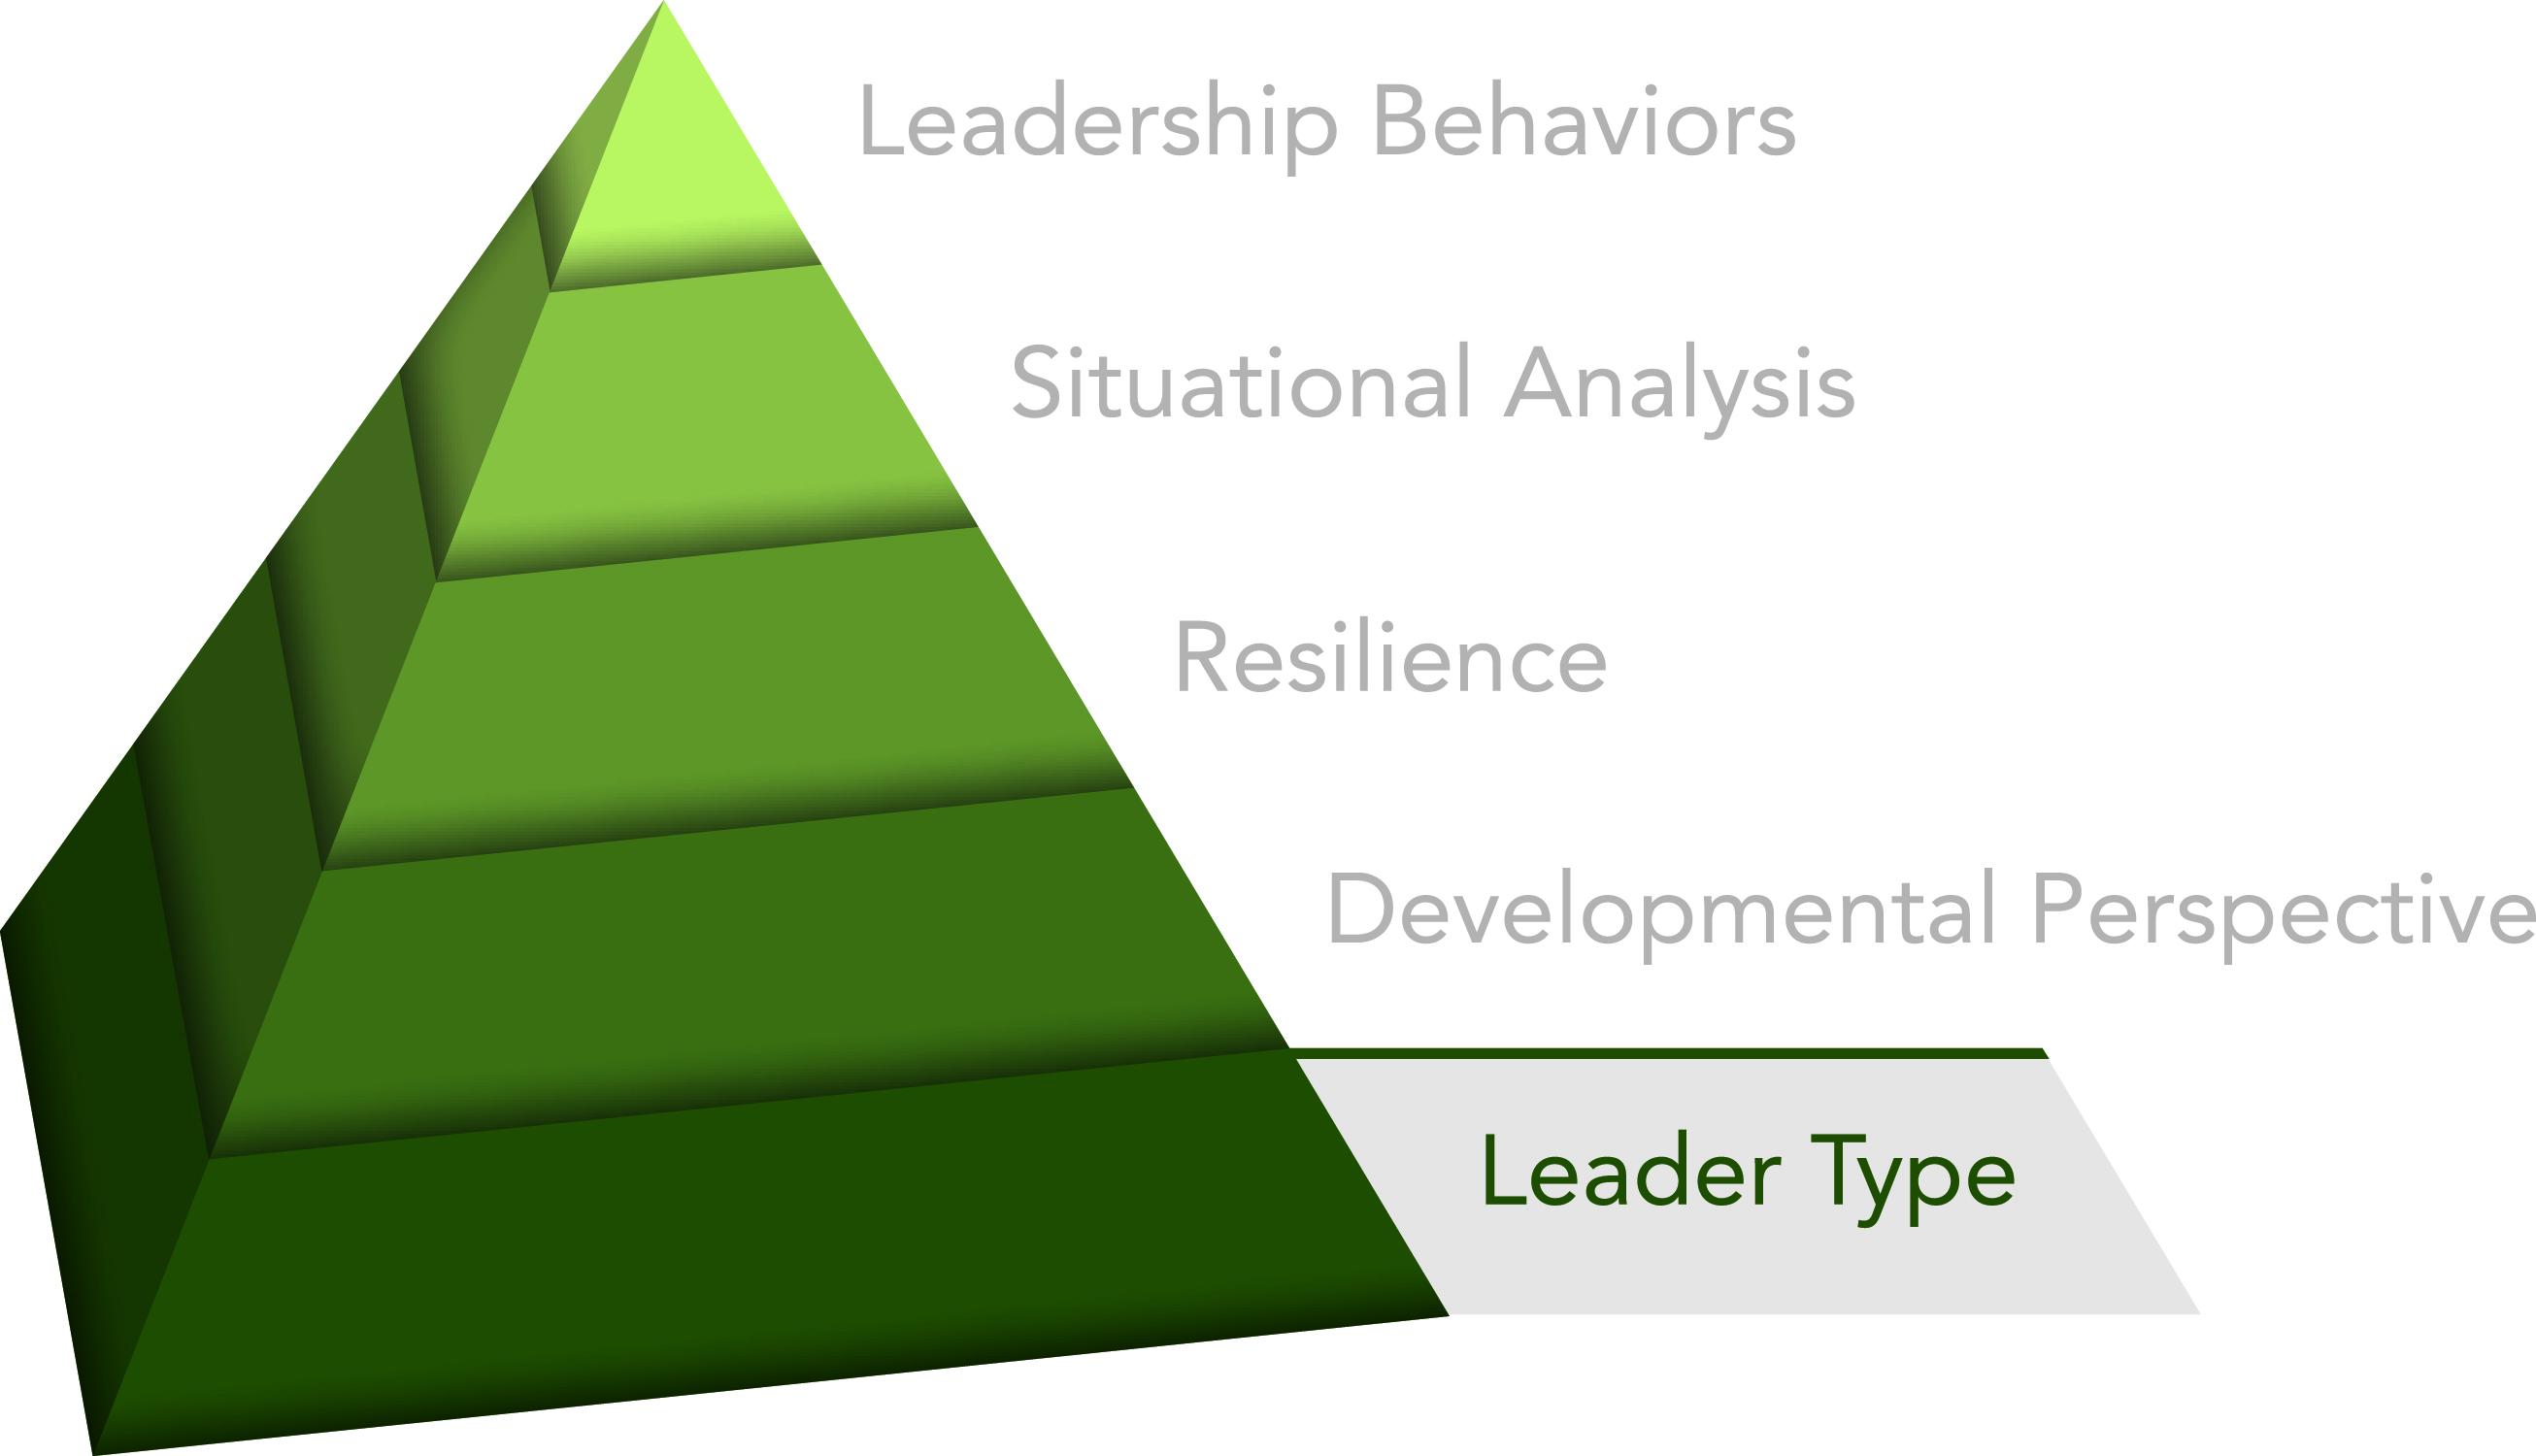 Innovative Leader Pyramid Leader Type